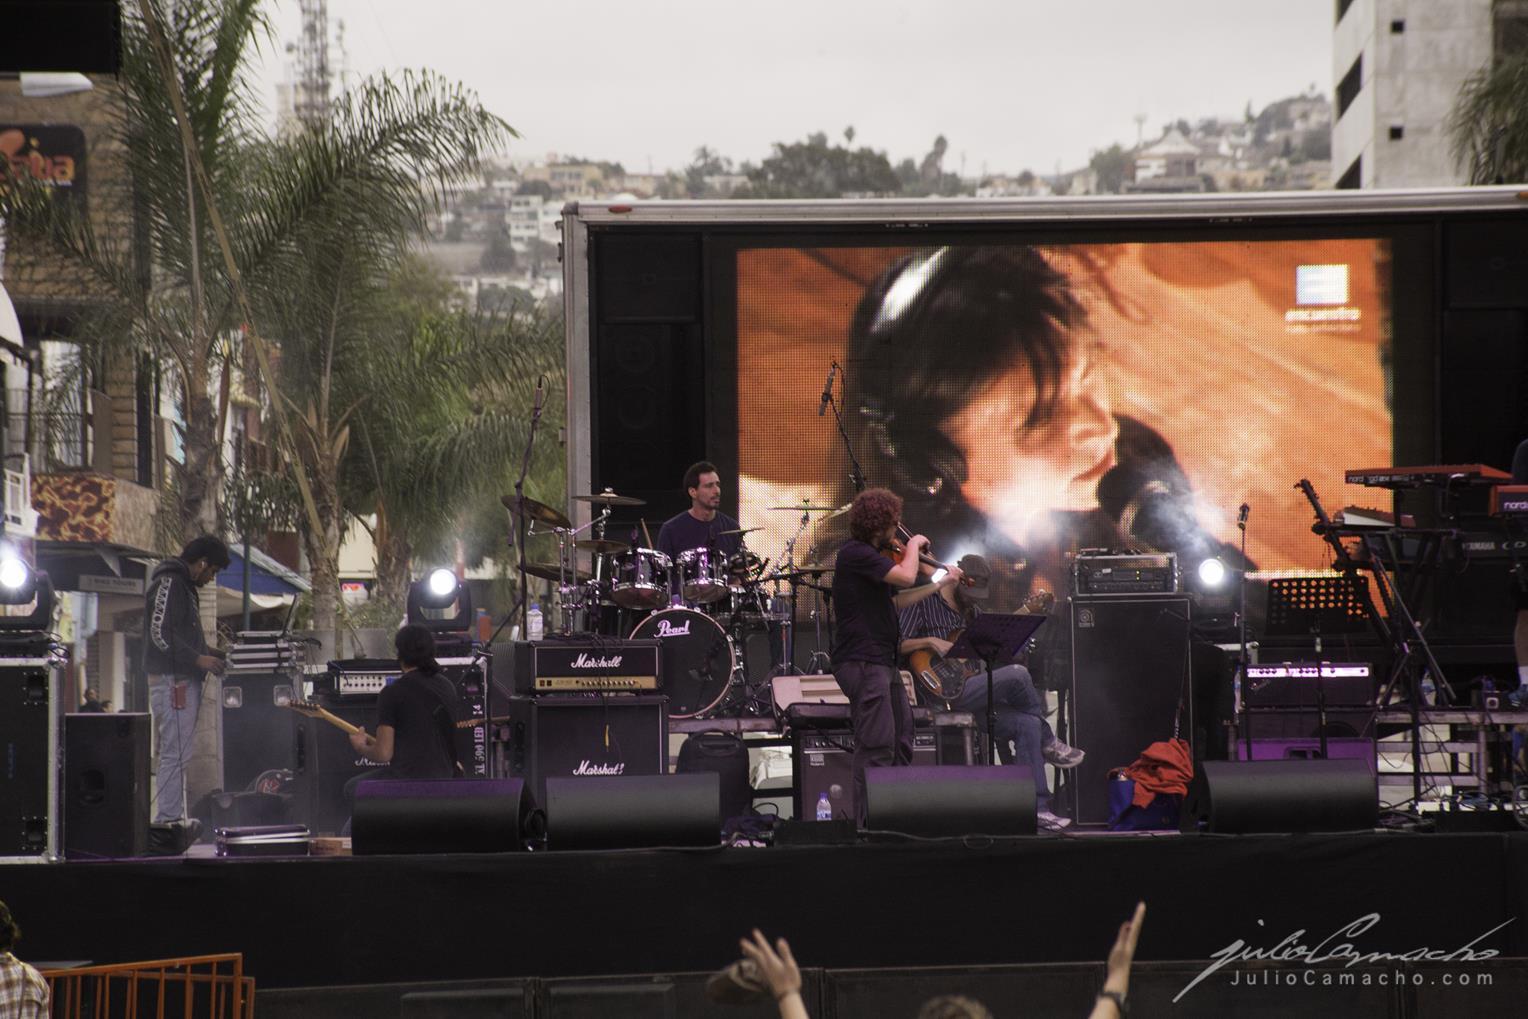 2014-10-30 31 CAST TOUR Ensenada y Tijuana - 1264 - www.Juli (Copy).jpg